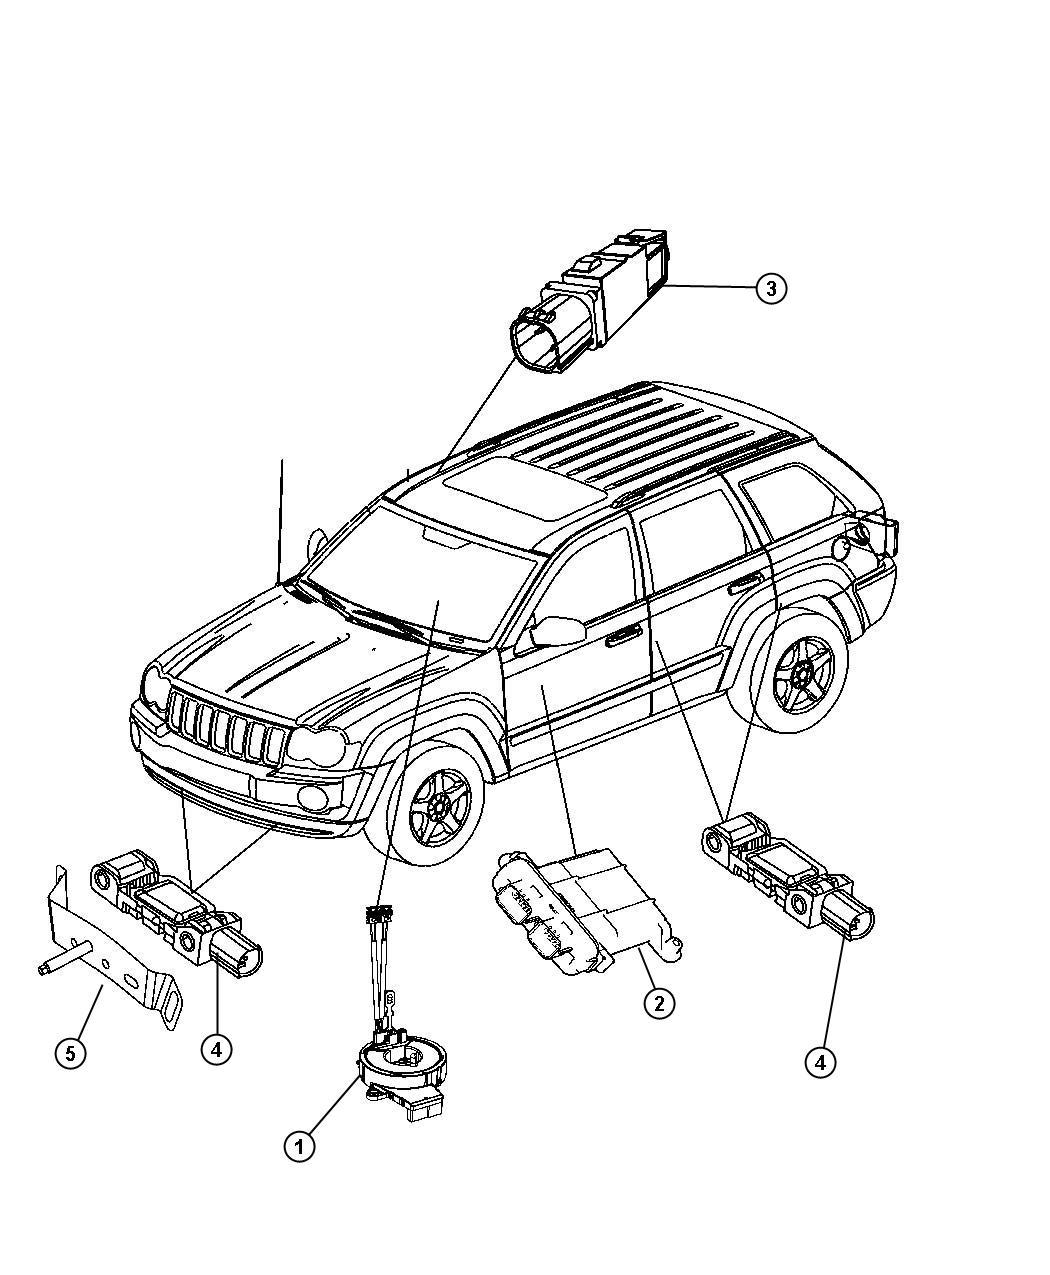 Jeep Grand Cherokee Bracket. Air bag, air bag sensor